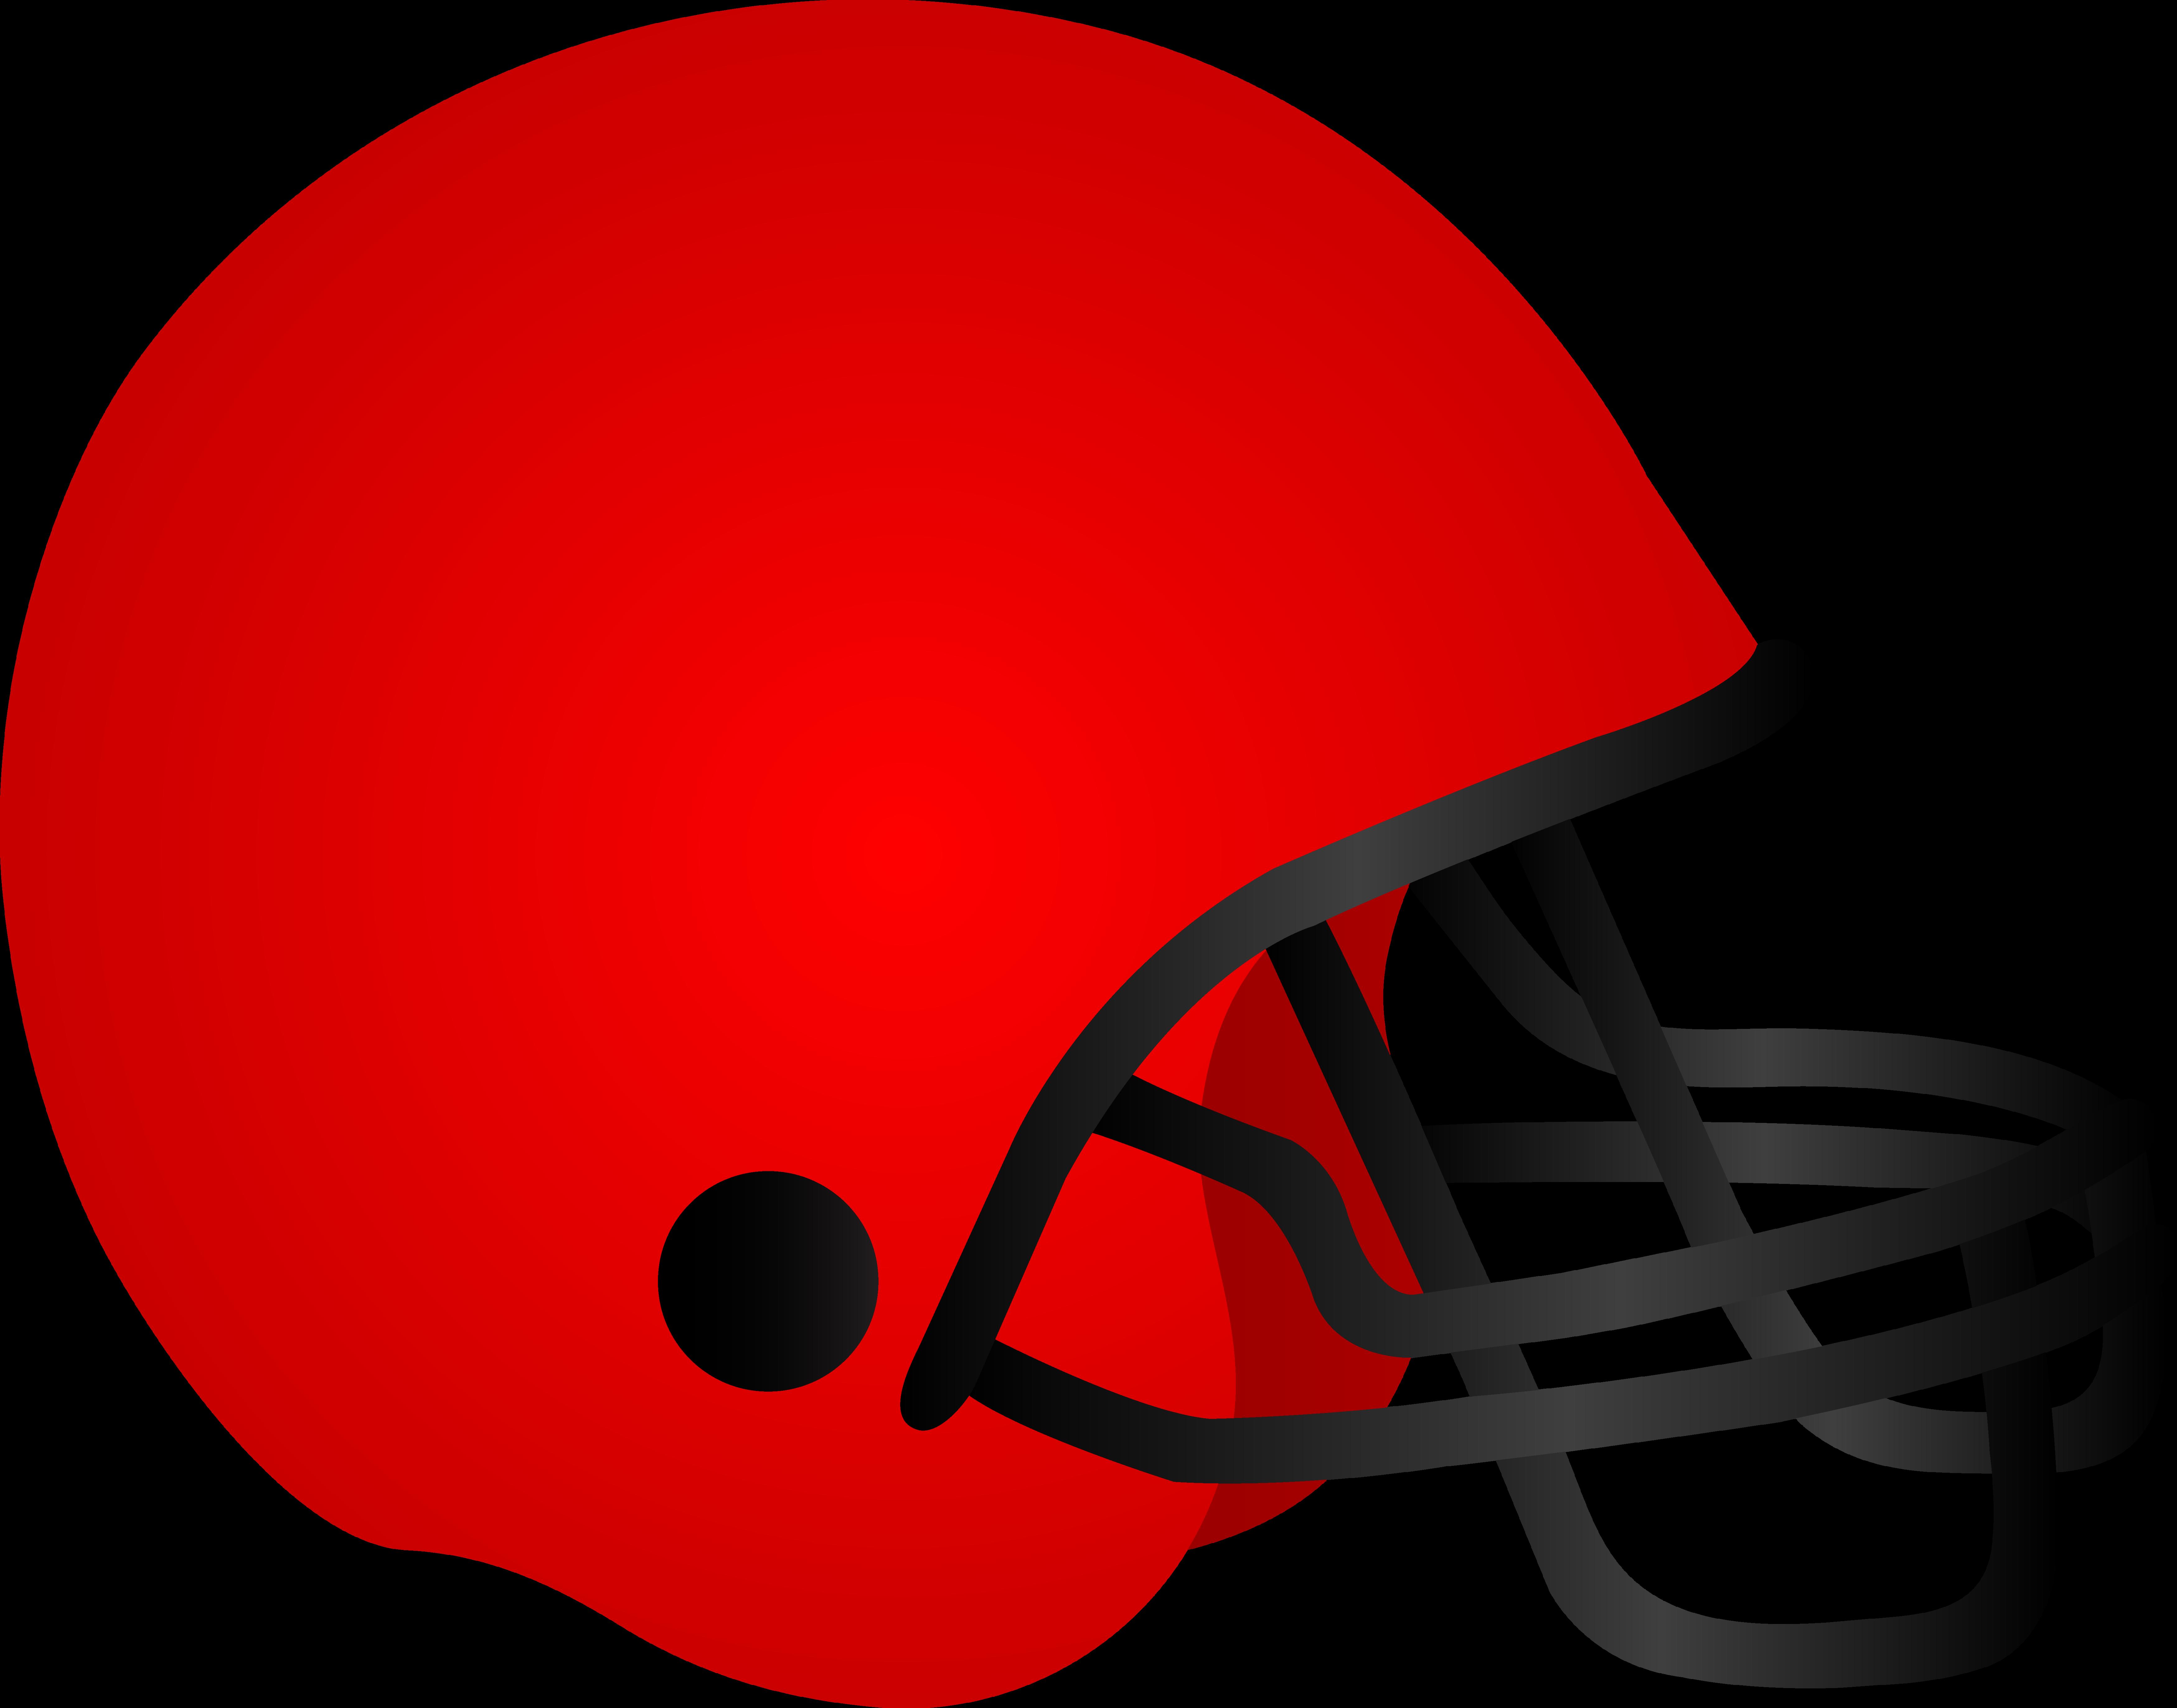 6994x5488 Top 59 Football Helmet Clip Art